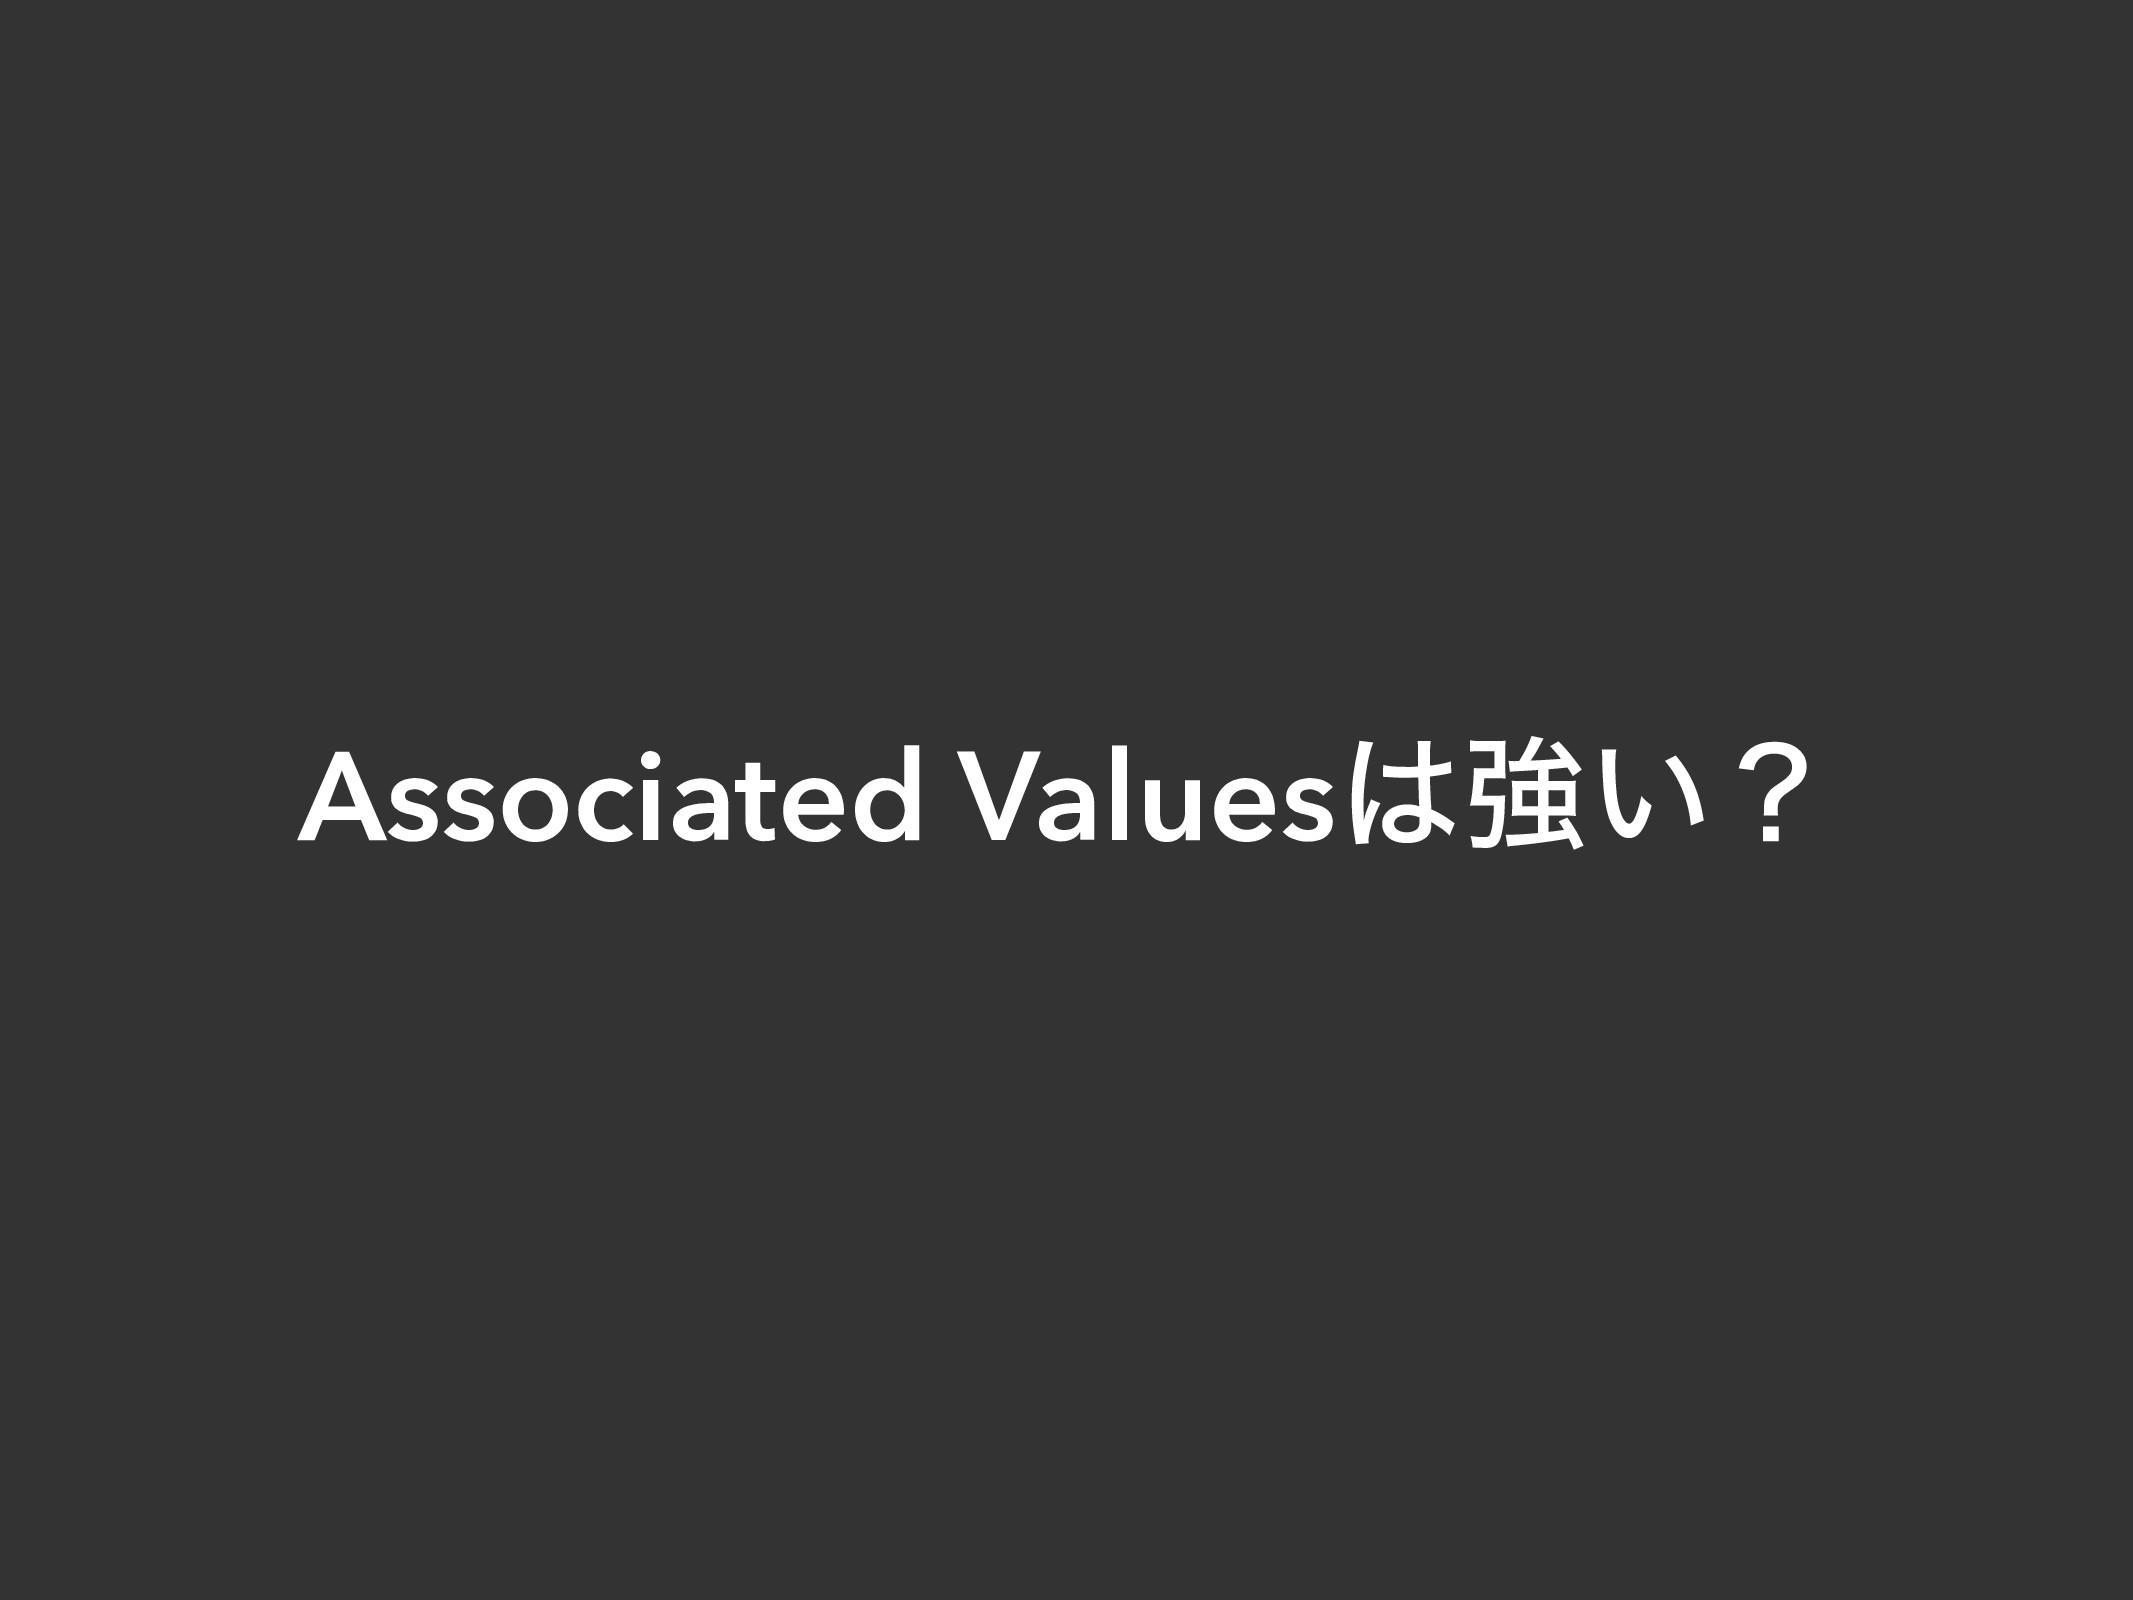 Associated Valuesڧ͍ʁ